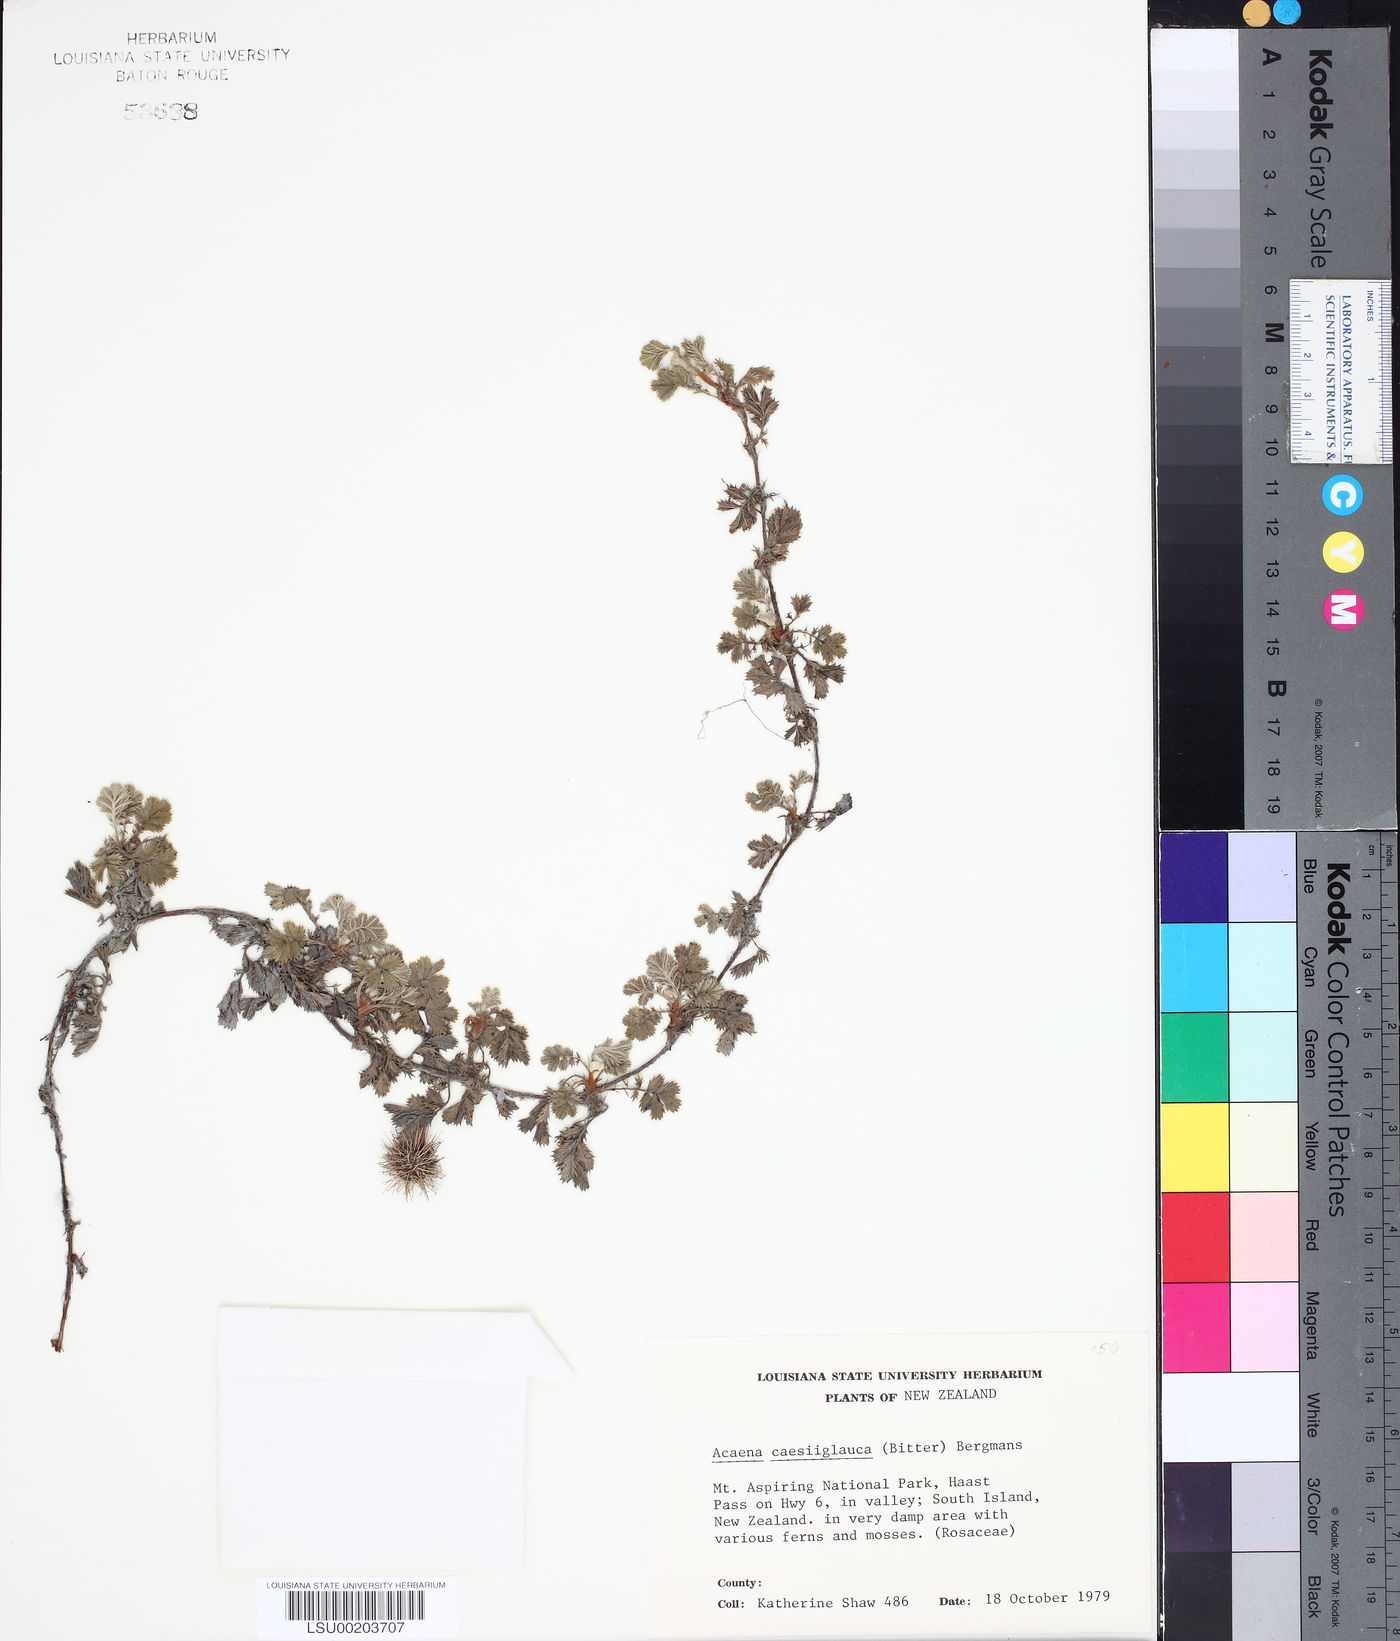 Acaena caesiglauca image